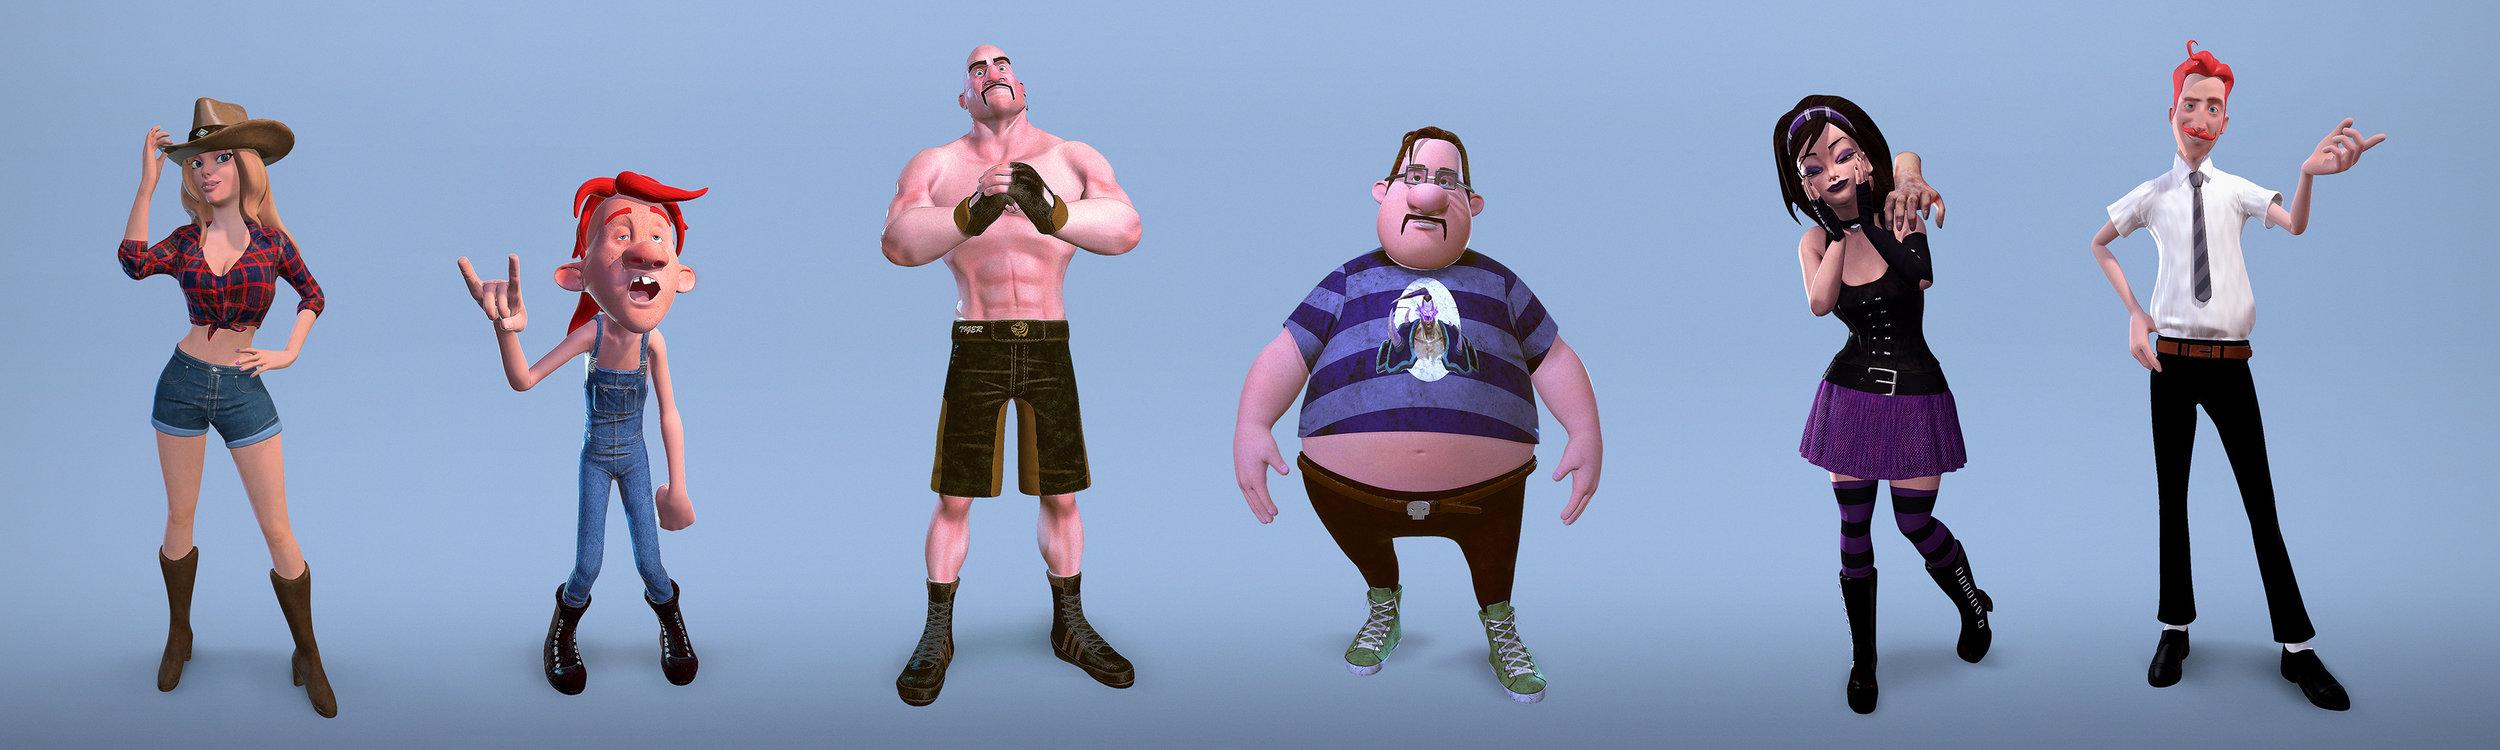 Character presentations_Jorge_Barrero.jpg